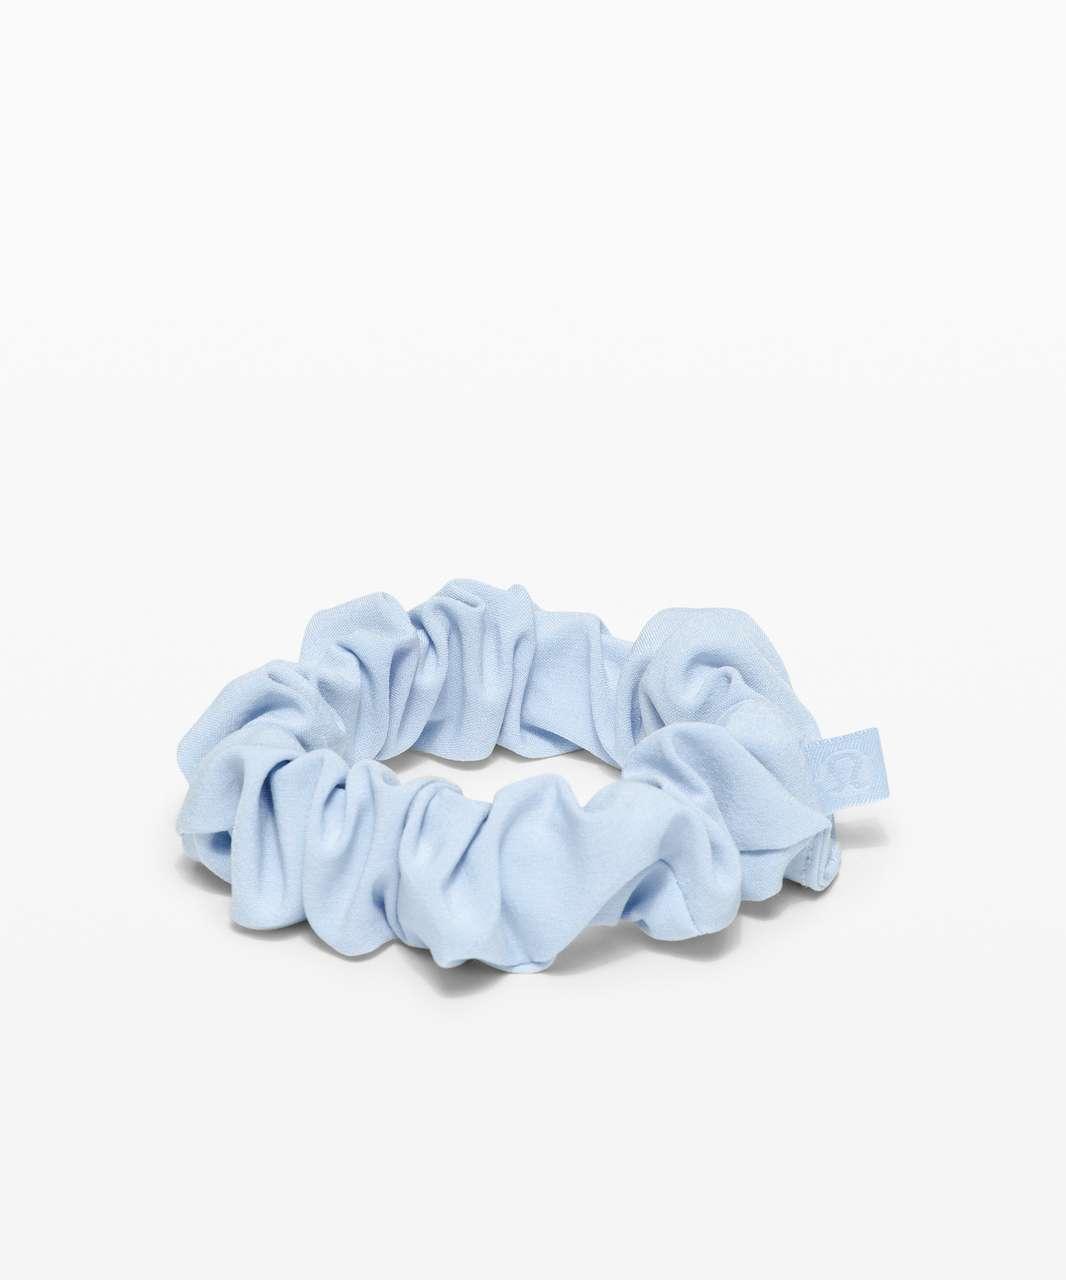 Lululemon Uplifting Scrunchie - Blue Linen